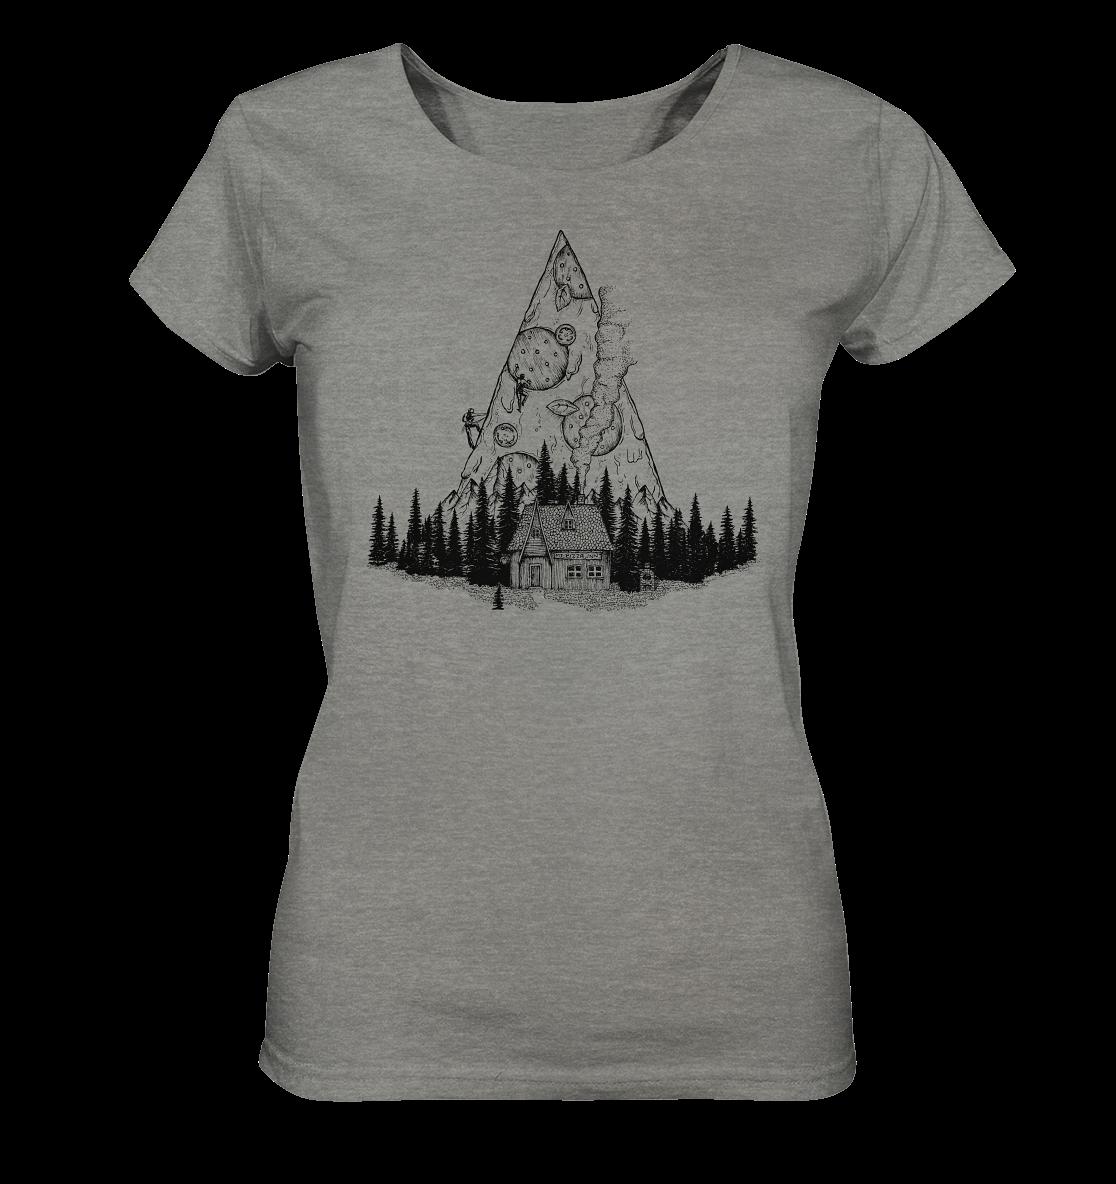 front-ladies-organic-shirt-meliert-818381-1116x-6.png